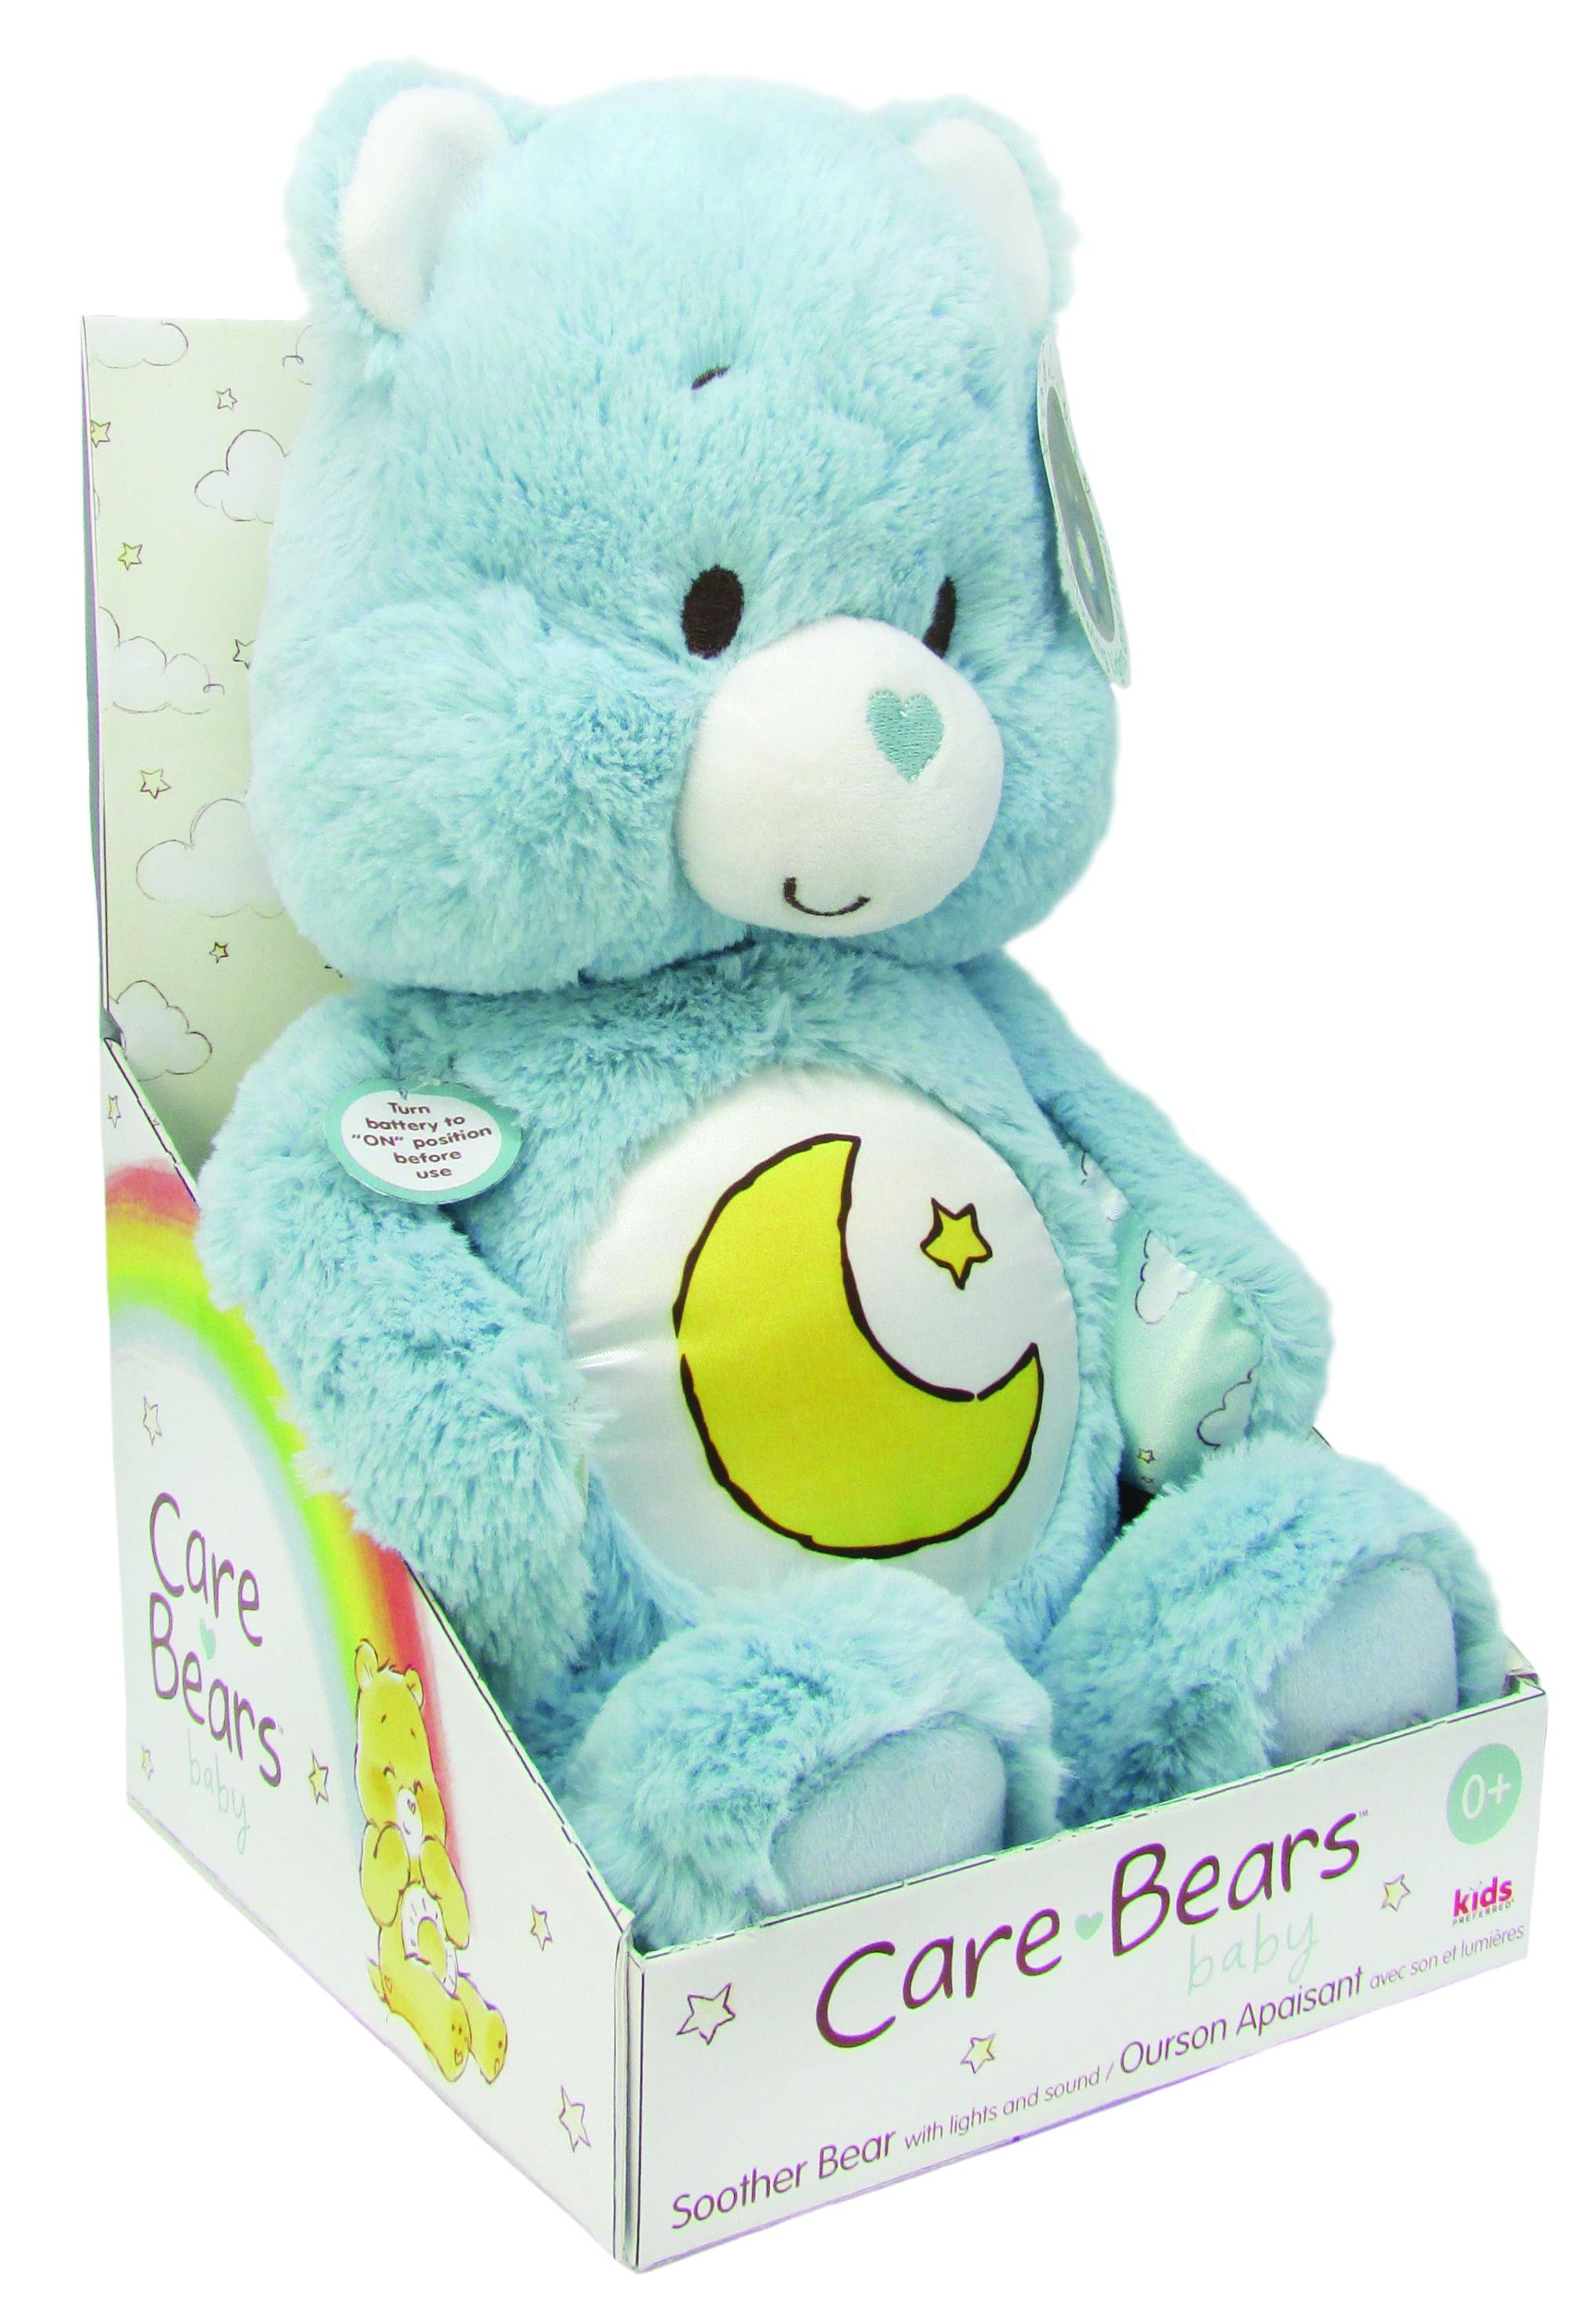 Message Recorder Stuffed Animals, Care Bears Bedtime Bear Soother Bear Plush With Music Lights Walmart Com Walmart Com